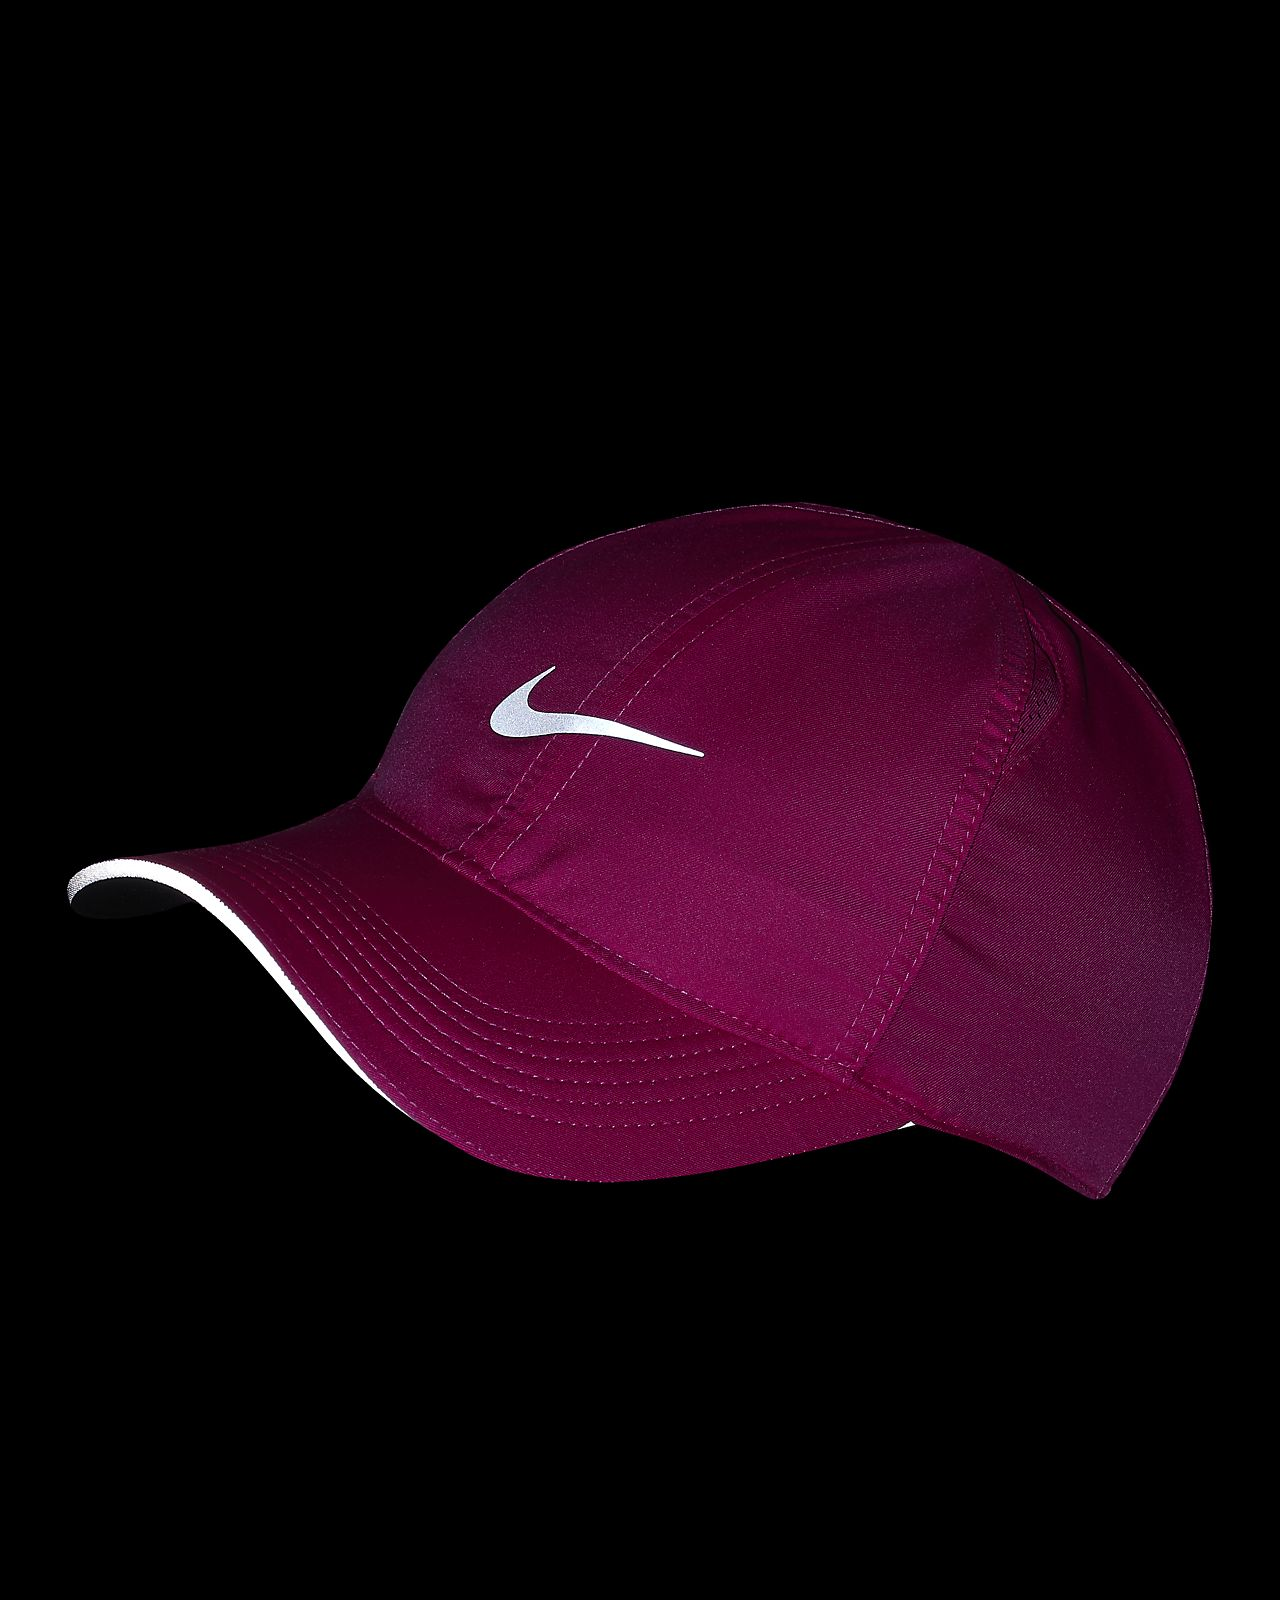 ebb6604c6f7198 Low Resolution Nike Featherlight Adjustable Running Hat Nike Featherlight  Adjustable Running Hat